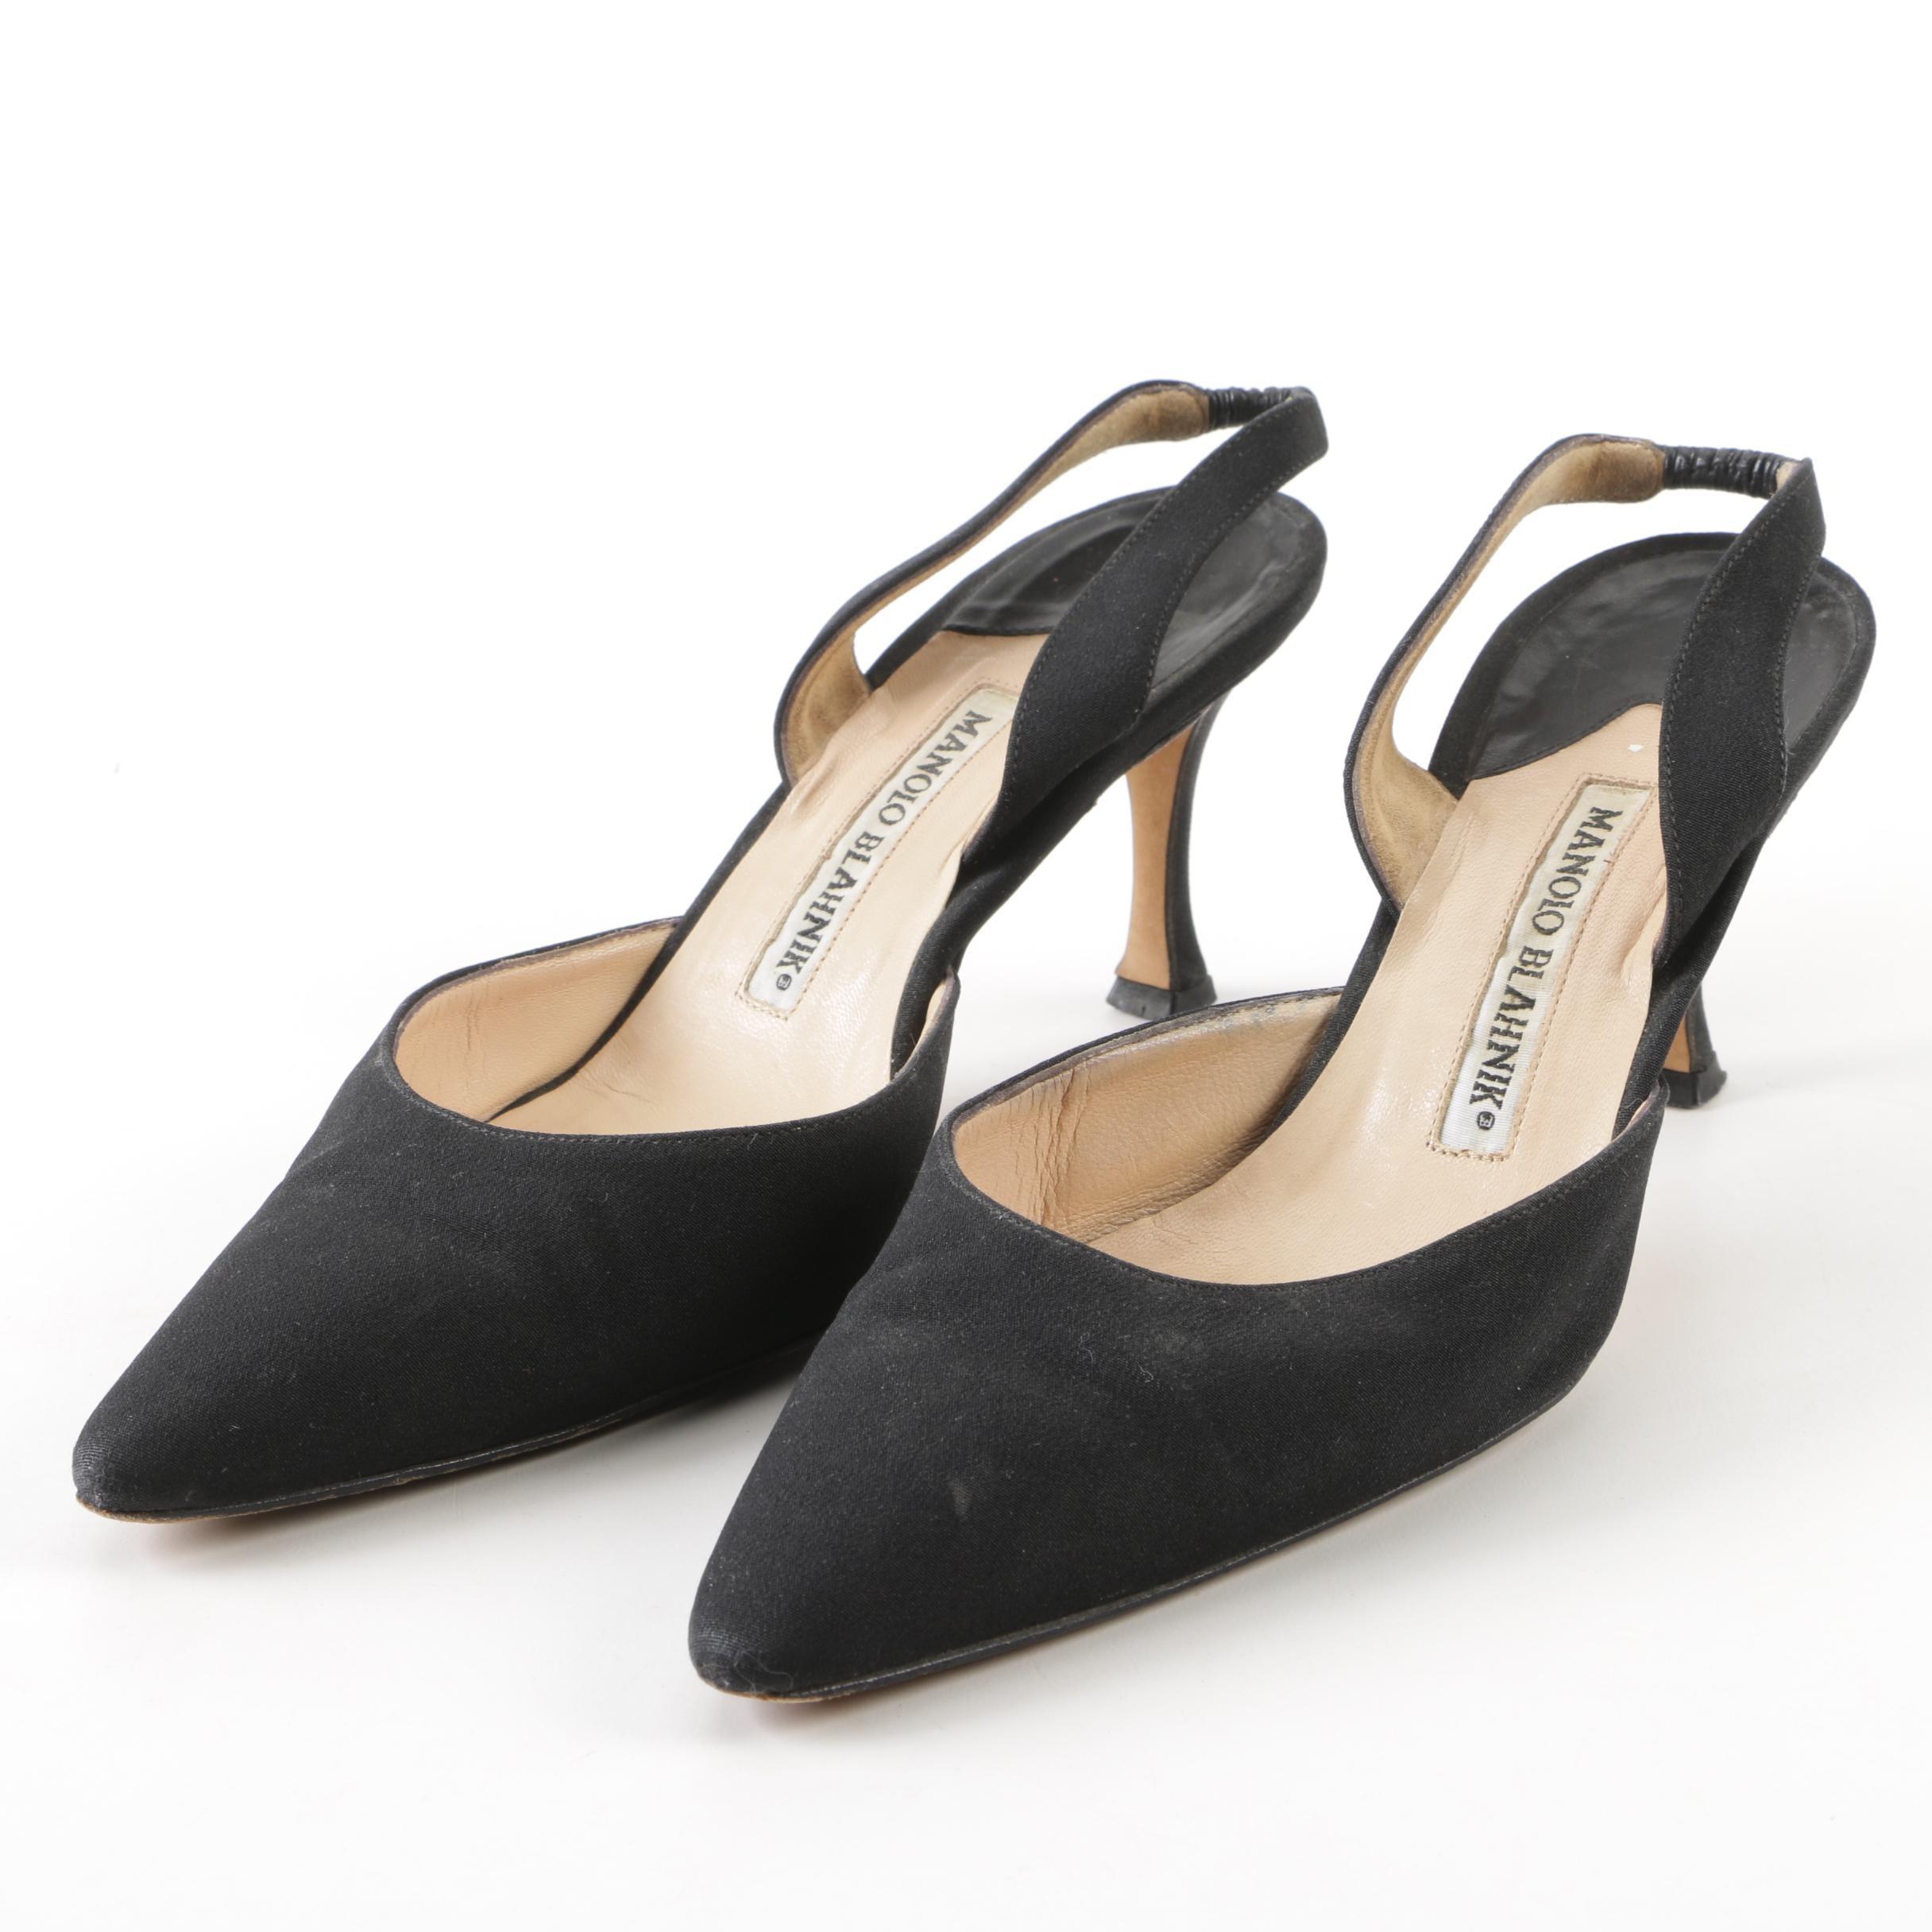 Manolo Blahnik Black Satin Pointed Toe Slingbacks